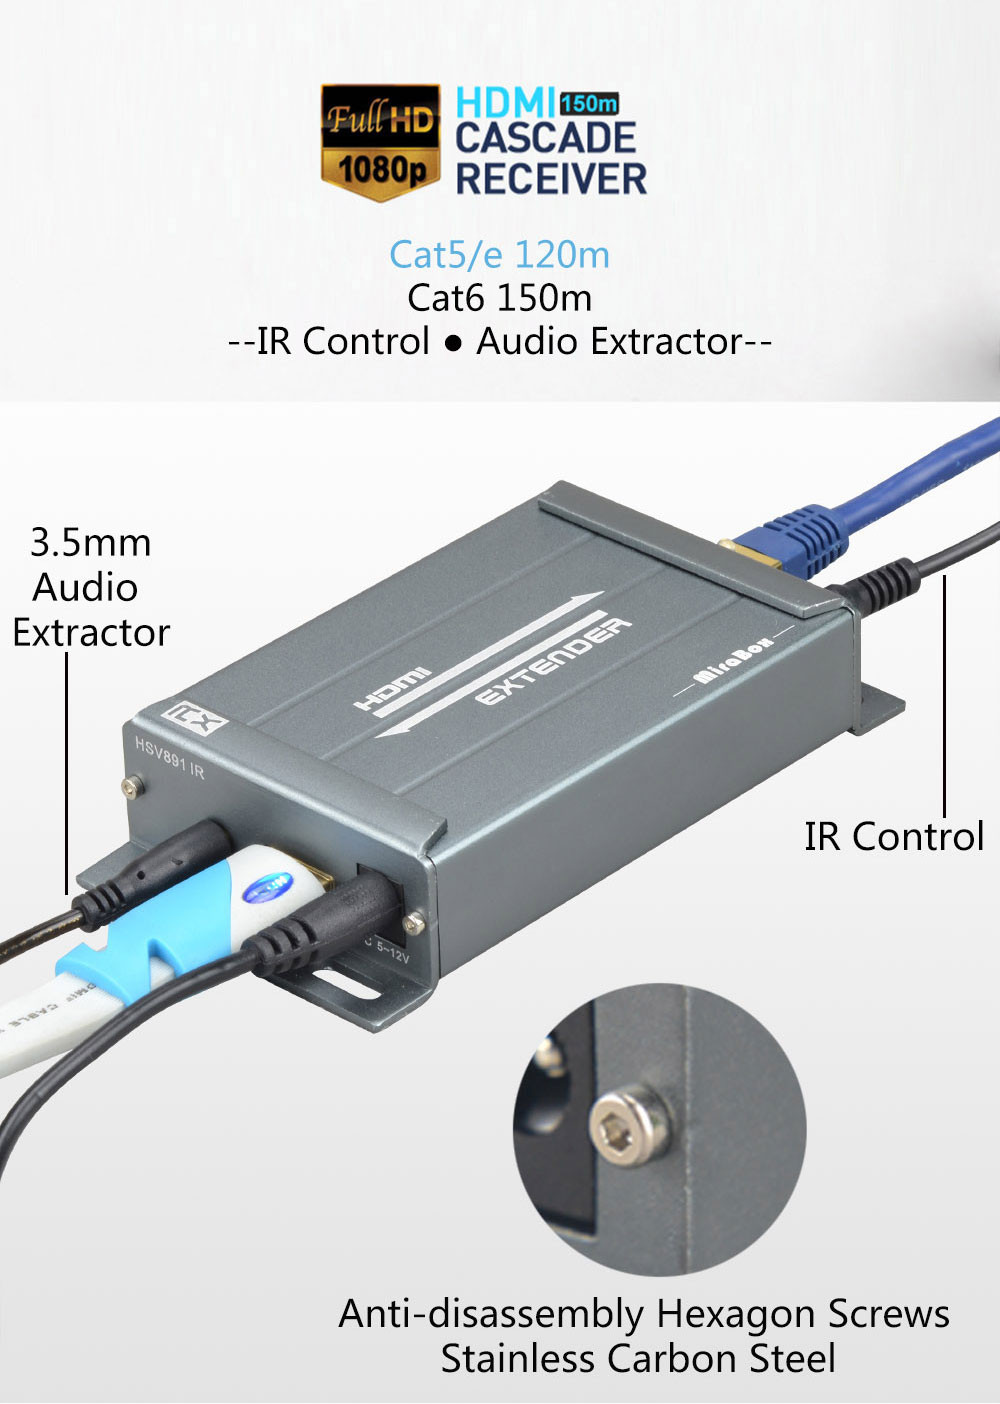 HDMI-EXTENDER-HSV891IR_06